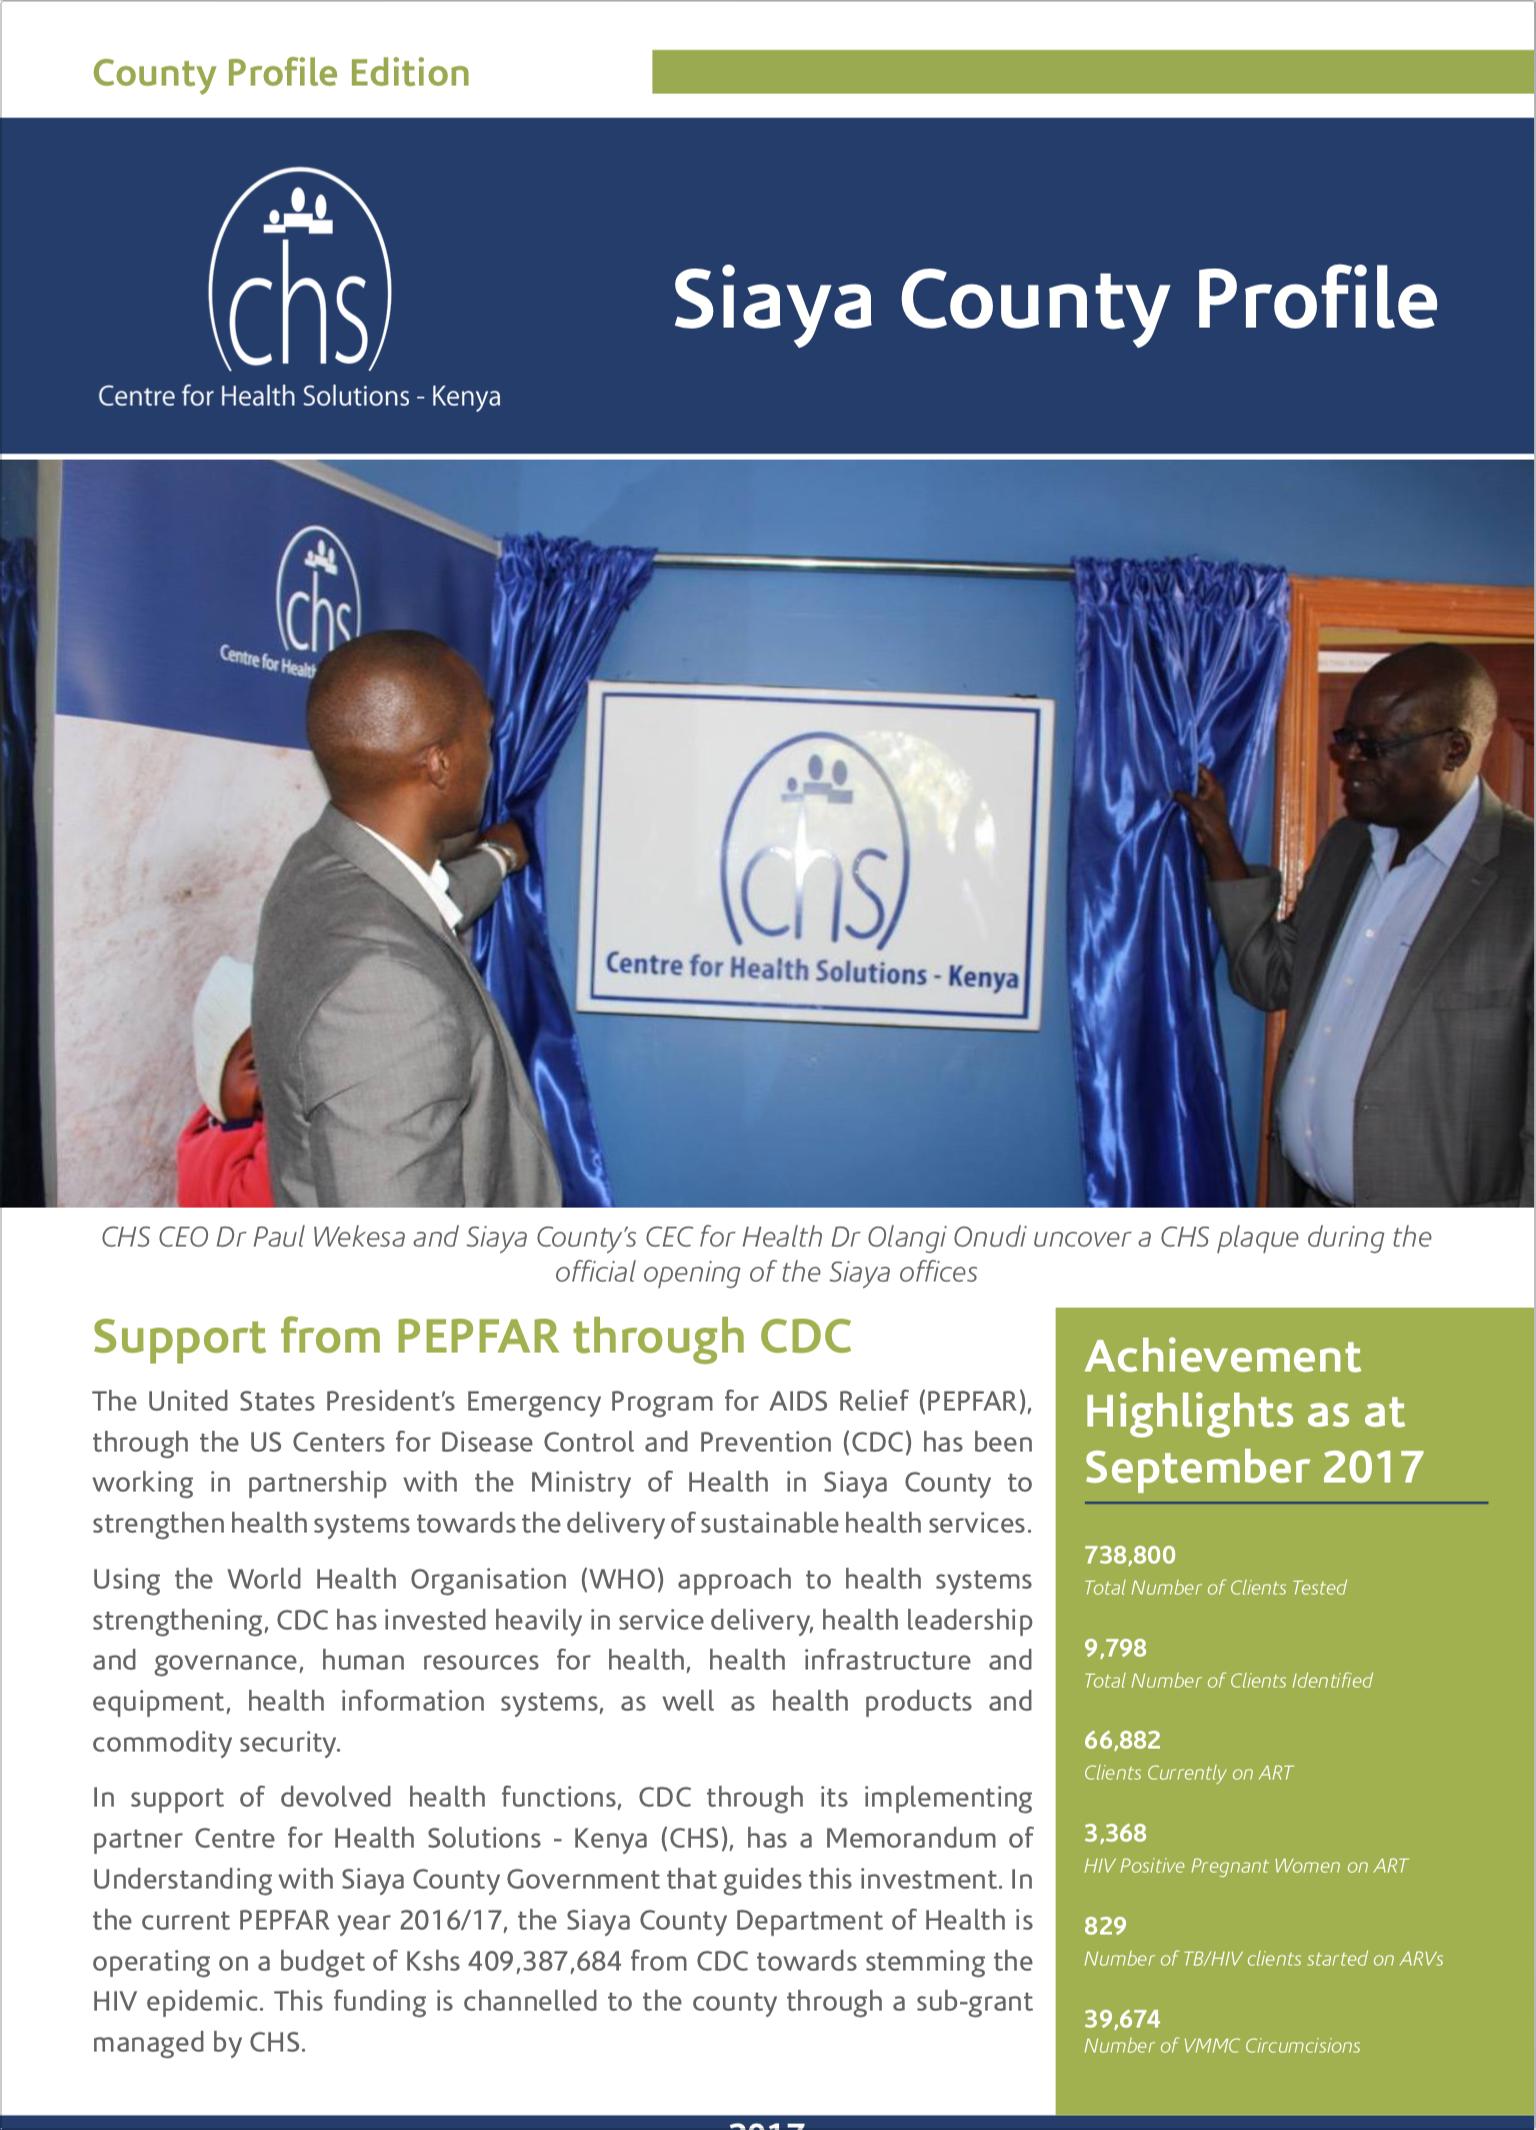 Featured Image - Siaya County Profile